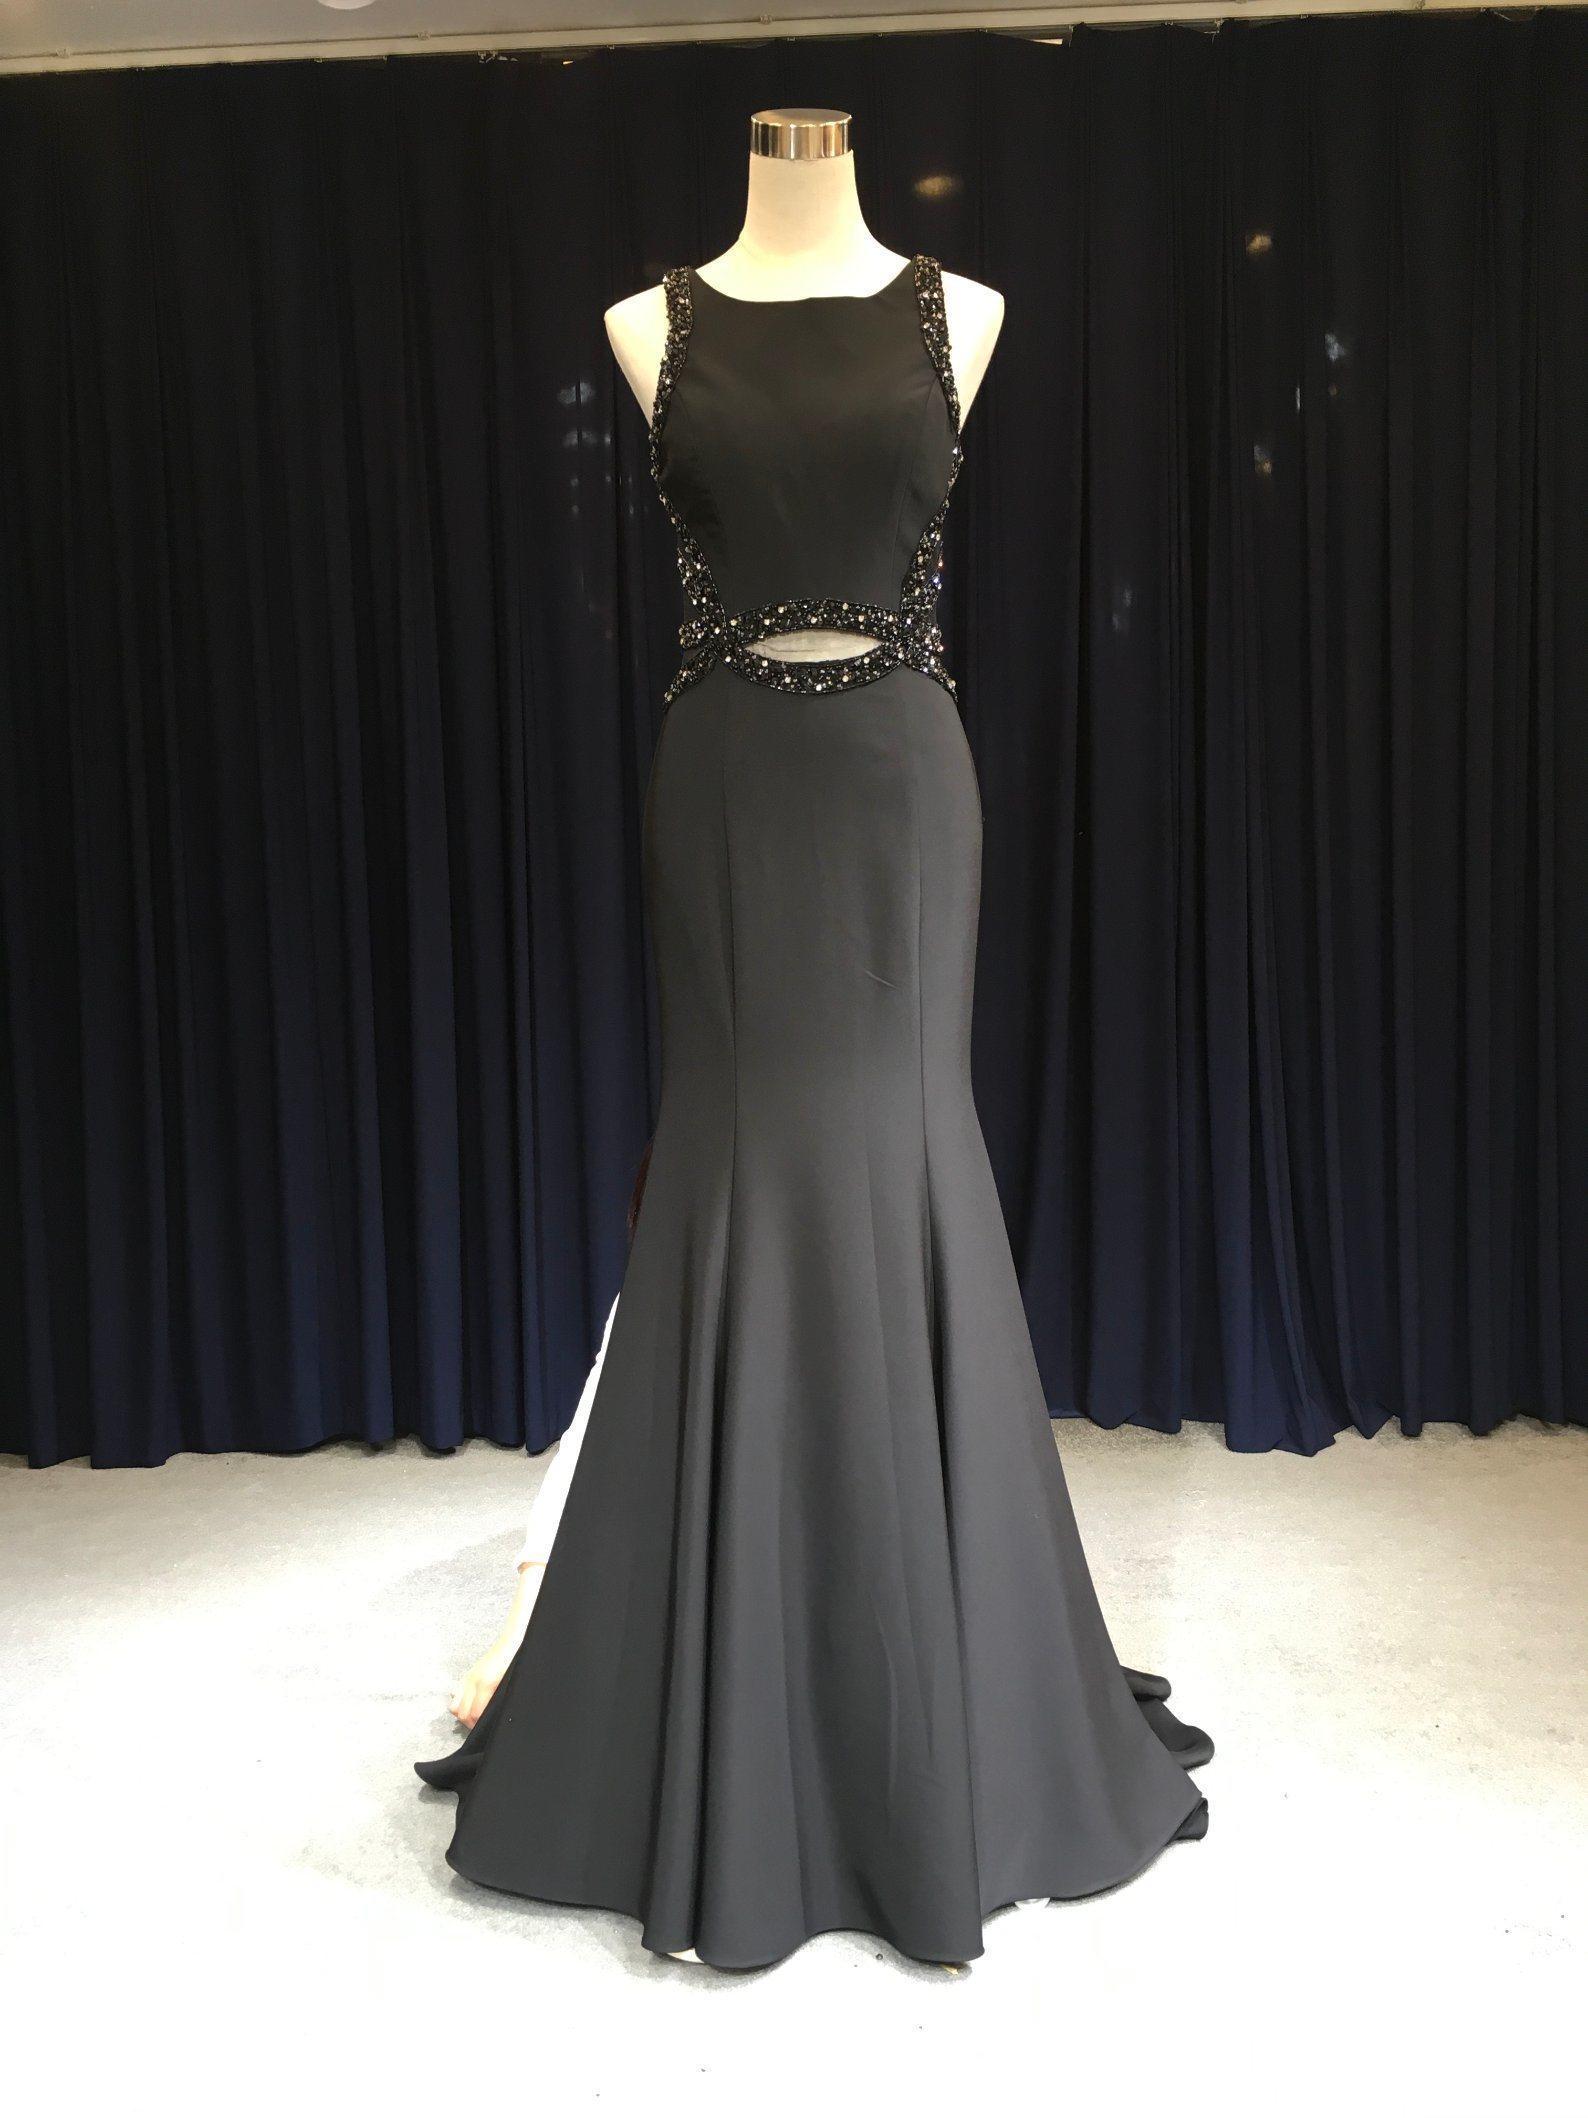 00045cebe27 China Aoliweiya Design Fashion Christmas Evening Dress 2019 - Black - China  Evening Dress